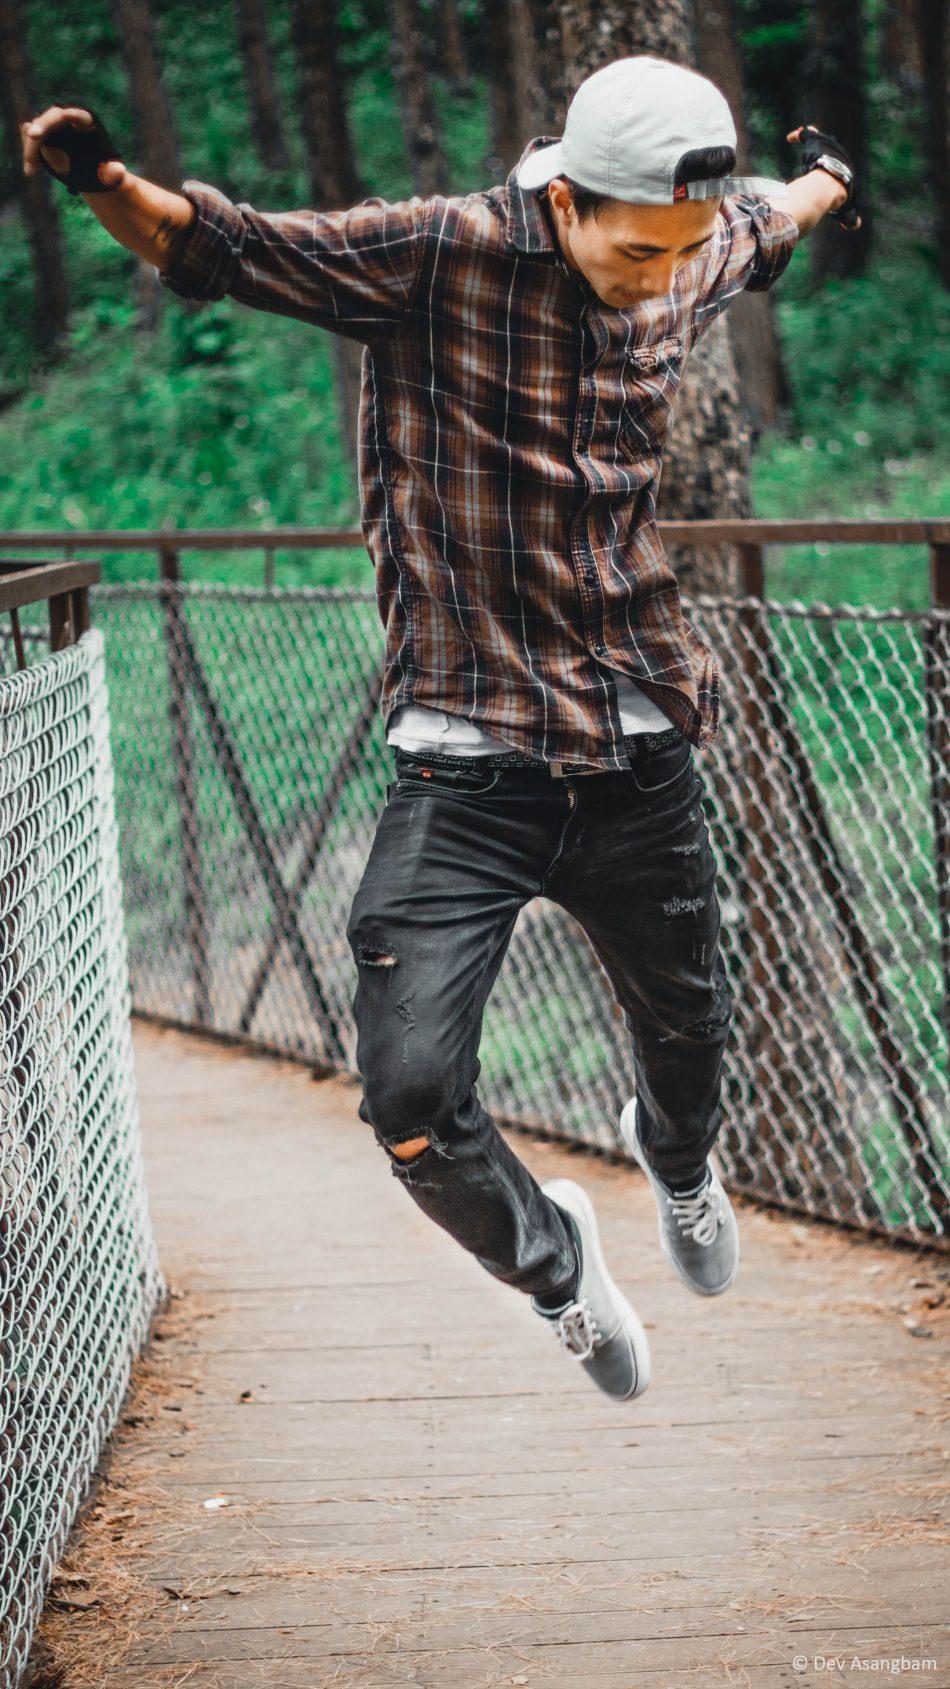 Man Cap Sneakers Jumping Photography 4K Ultra HD Mobile Wallpaper